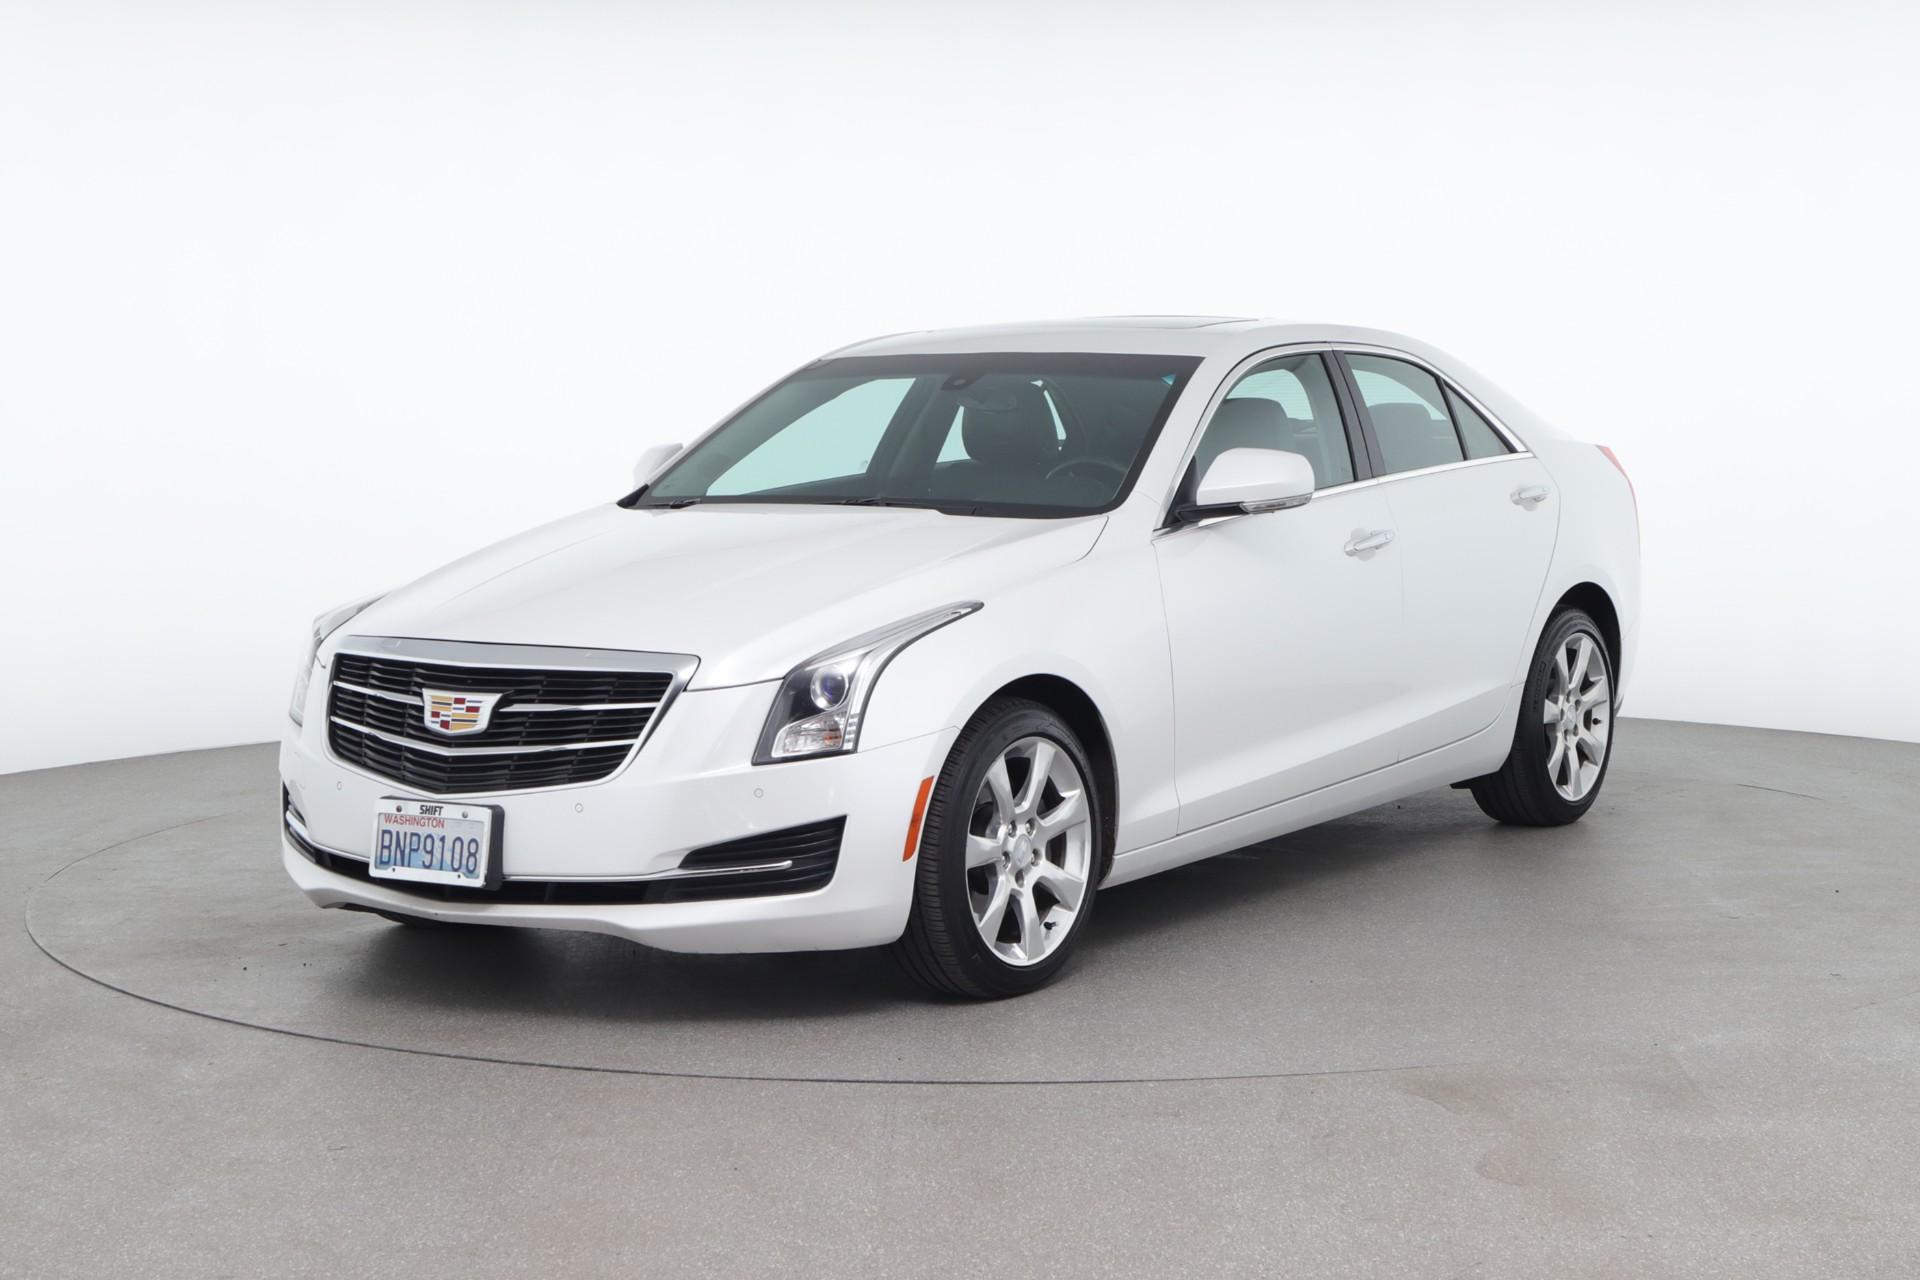 Cadillac ATS Luxury AWD (from $18,200)